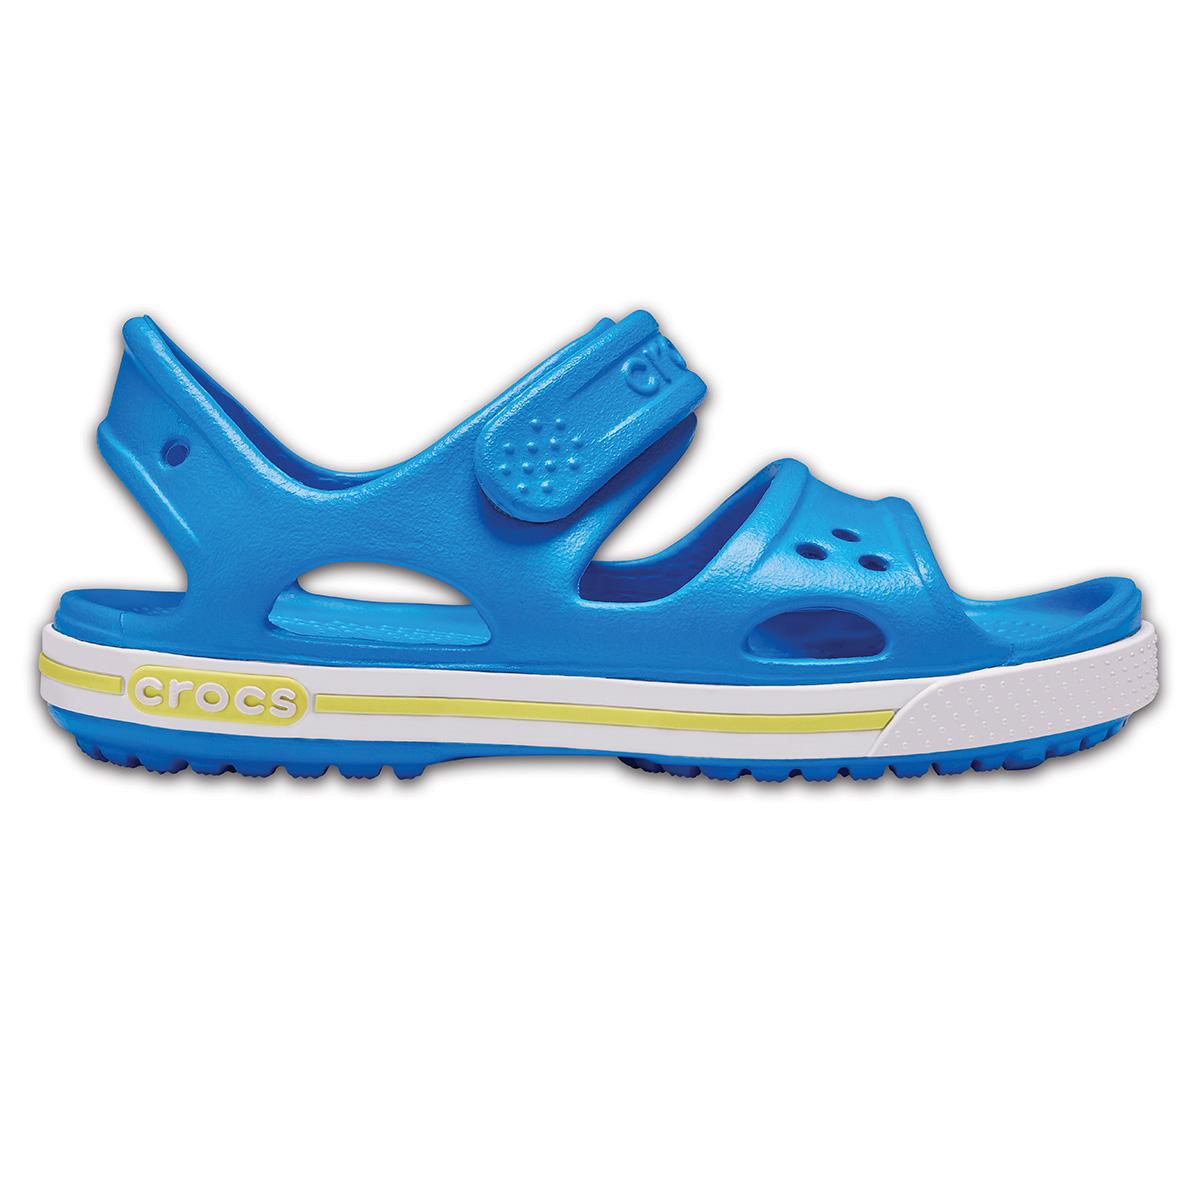 Crocs Crocband II Sandal PS - Okyanus/Tenis Topu Yeşil